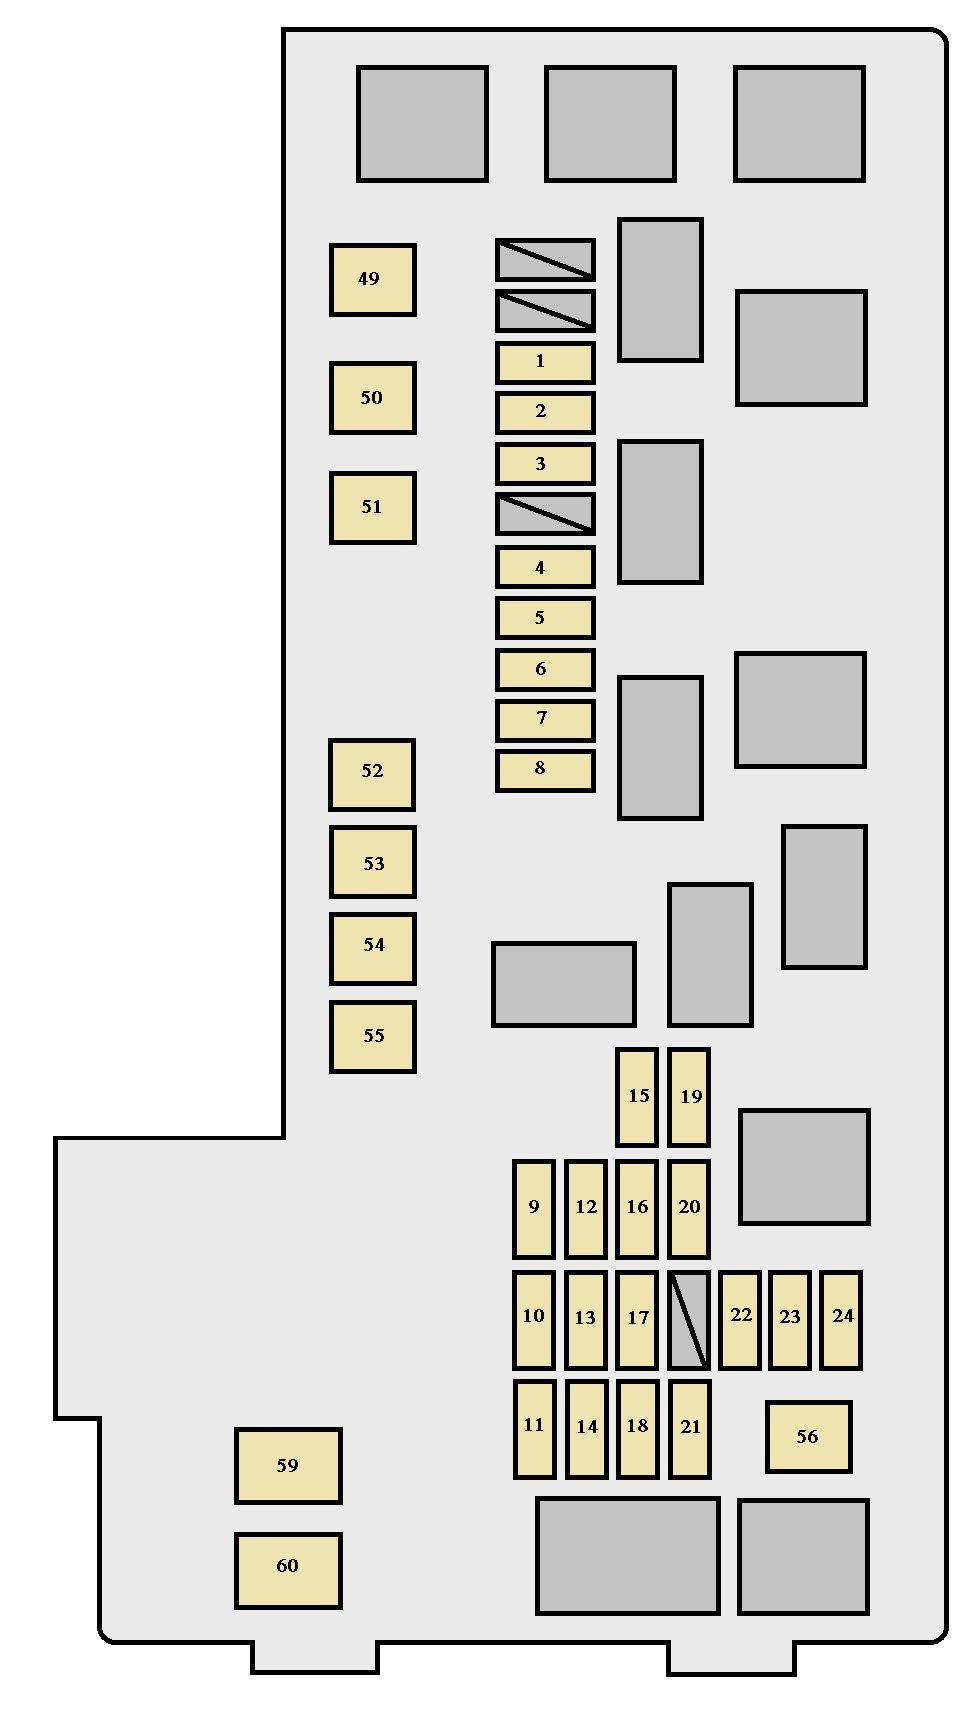 [ZSVE_7041]  VR_2933] 2007 Toyota Corolla Fuse Box Diagram Also 2004 Toyota Highlander  Fuse Wiring Diagram | 2007 Toyota Corolla Fuse Diagram |  | Oupli Ginia Mohammedshrine Librar Wiring 101